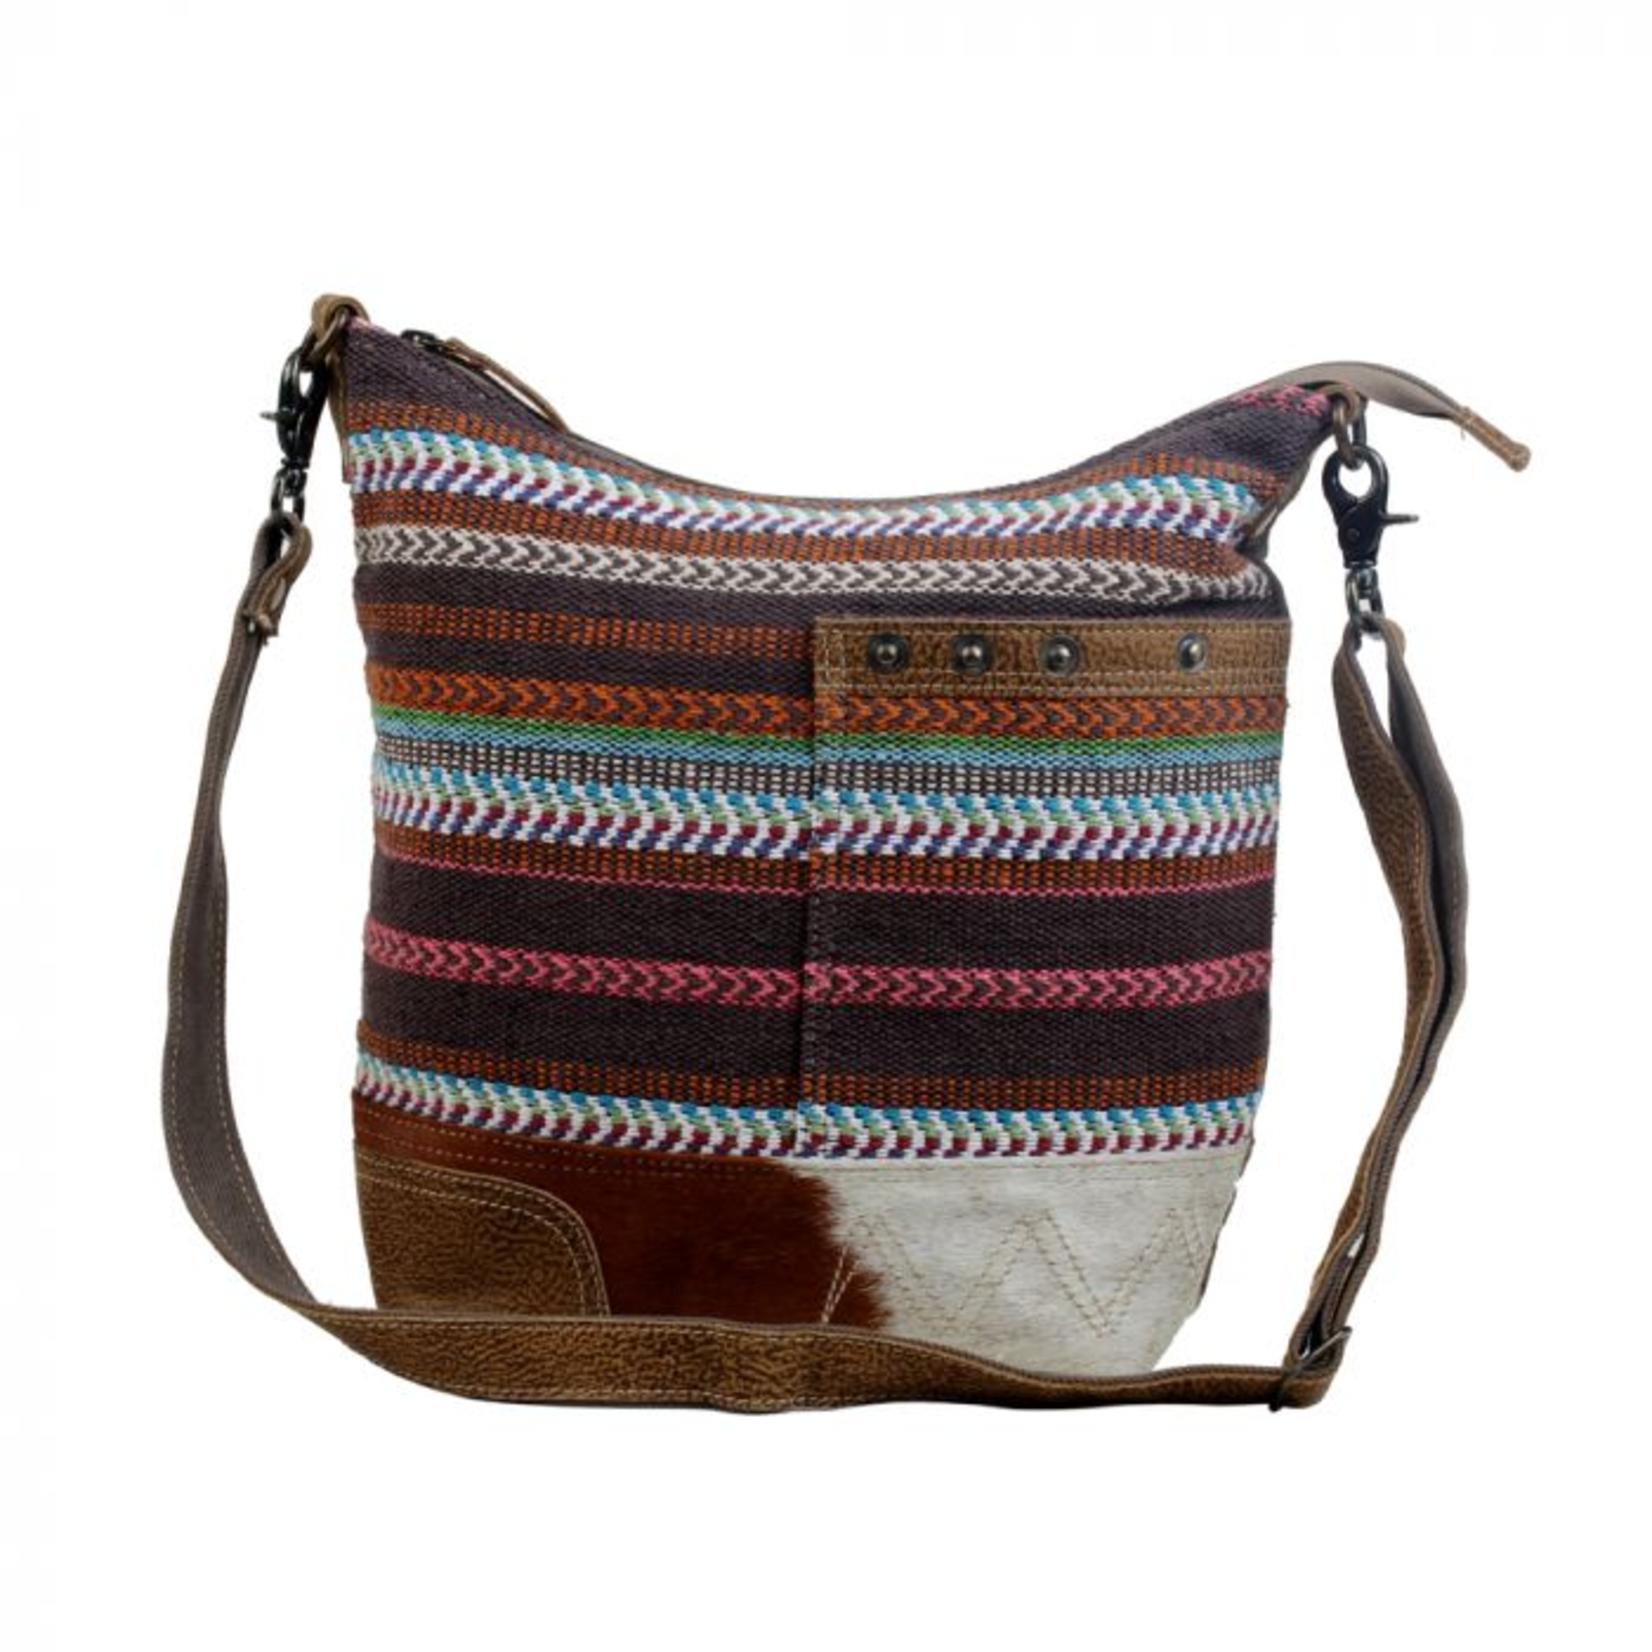 Myra Bag Bag: Layered Shoulder